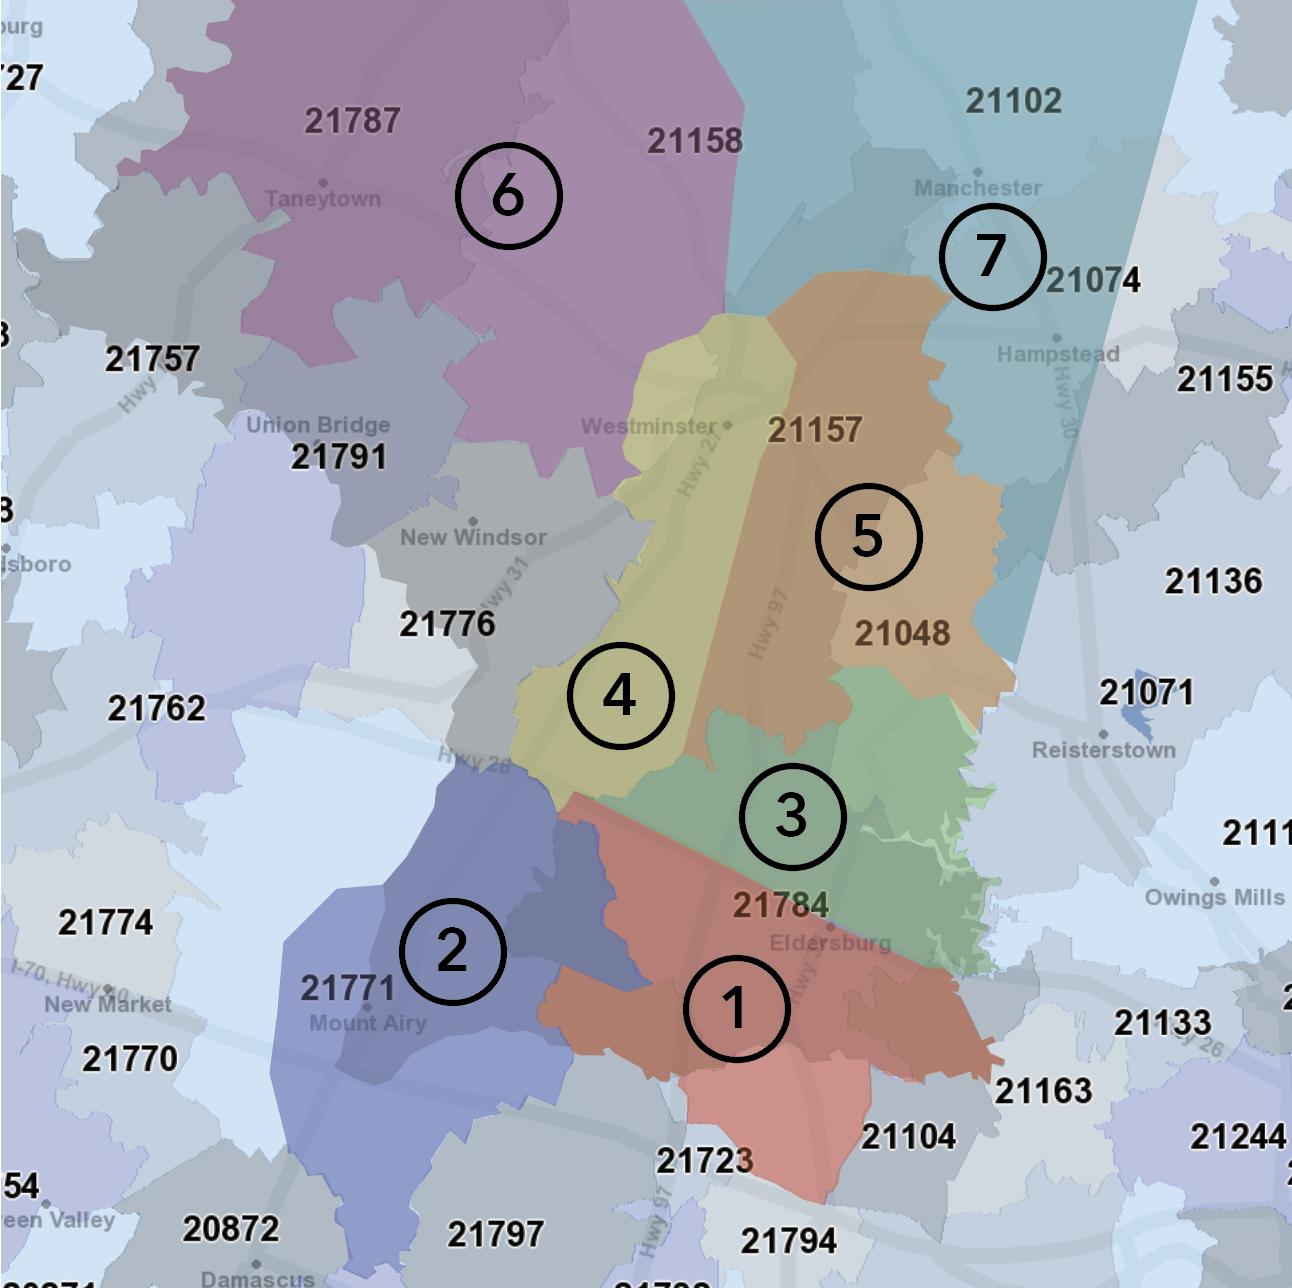 My Carroll Direct Regions